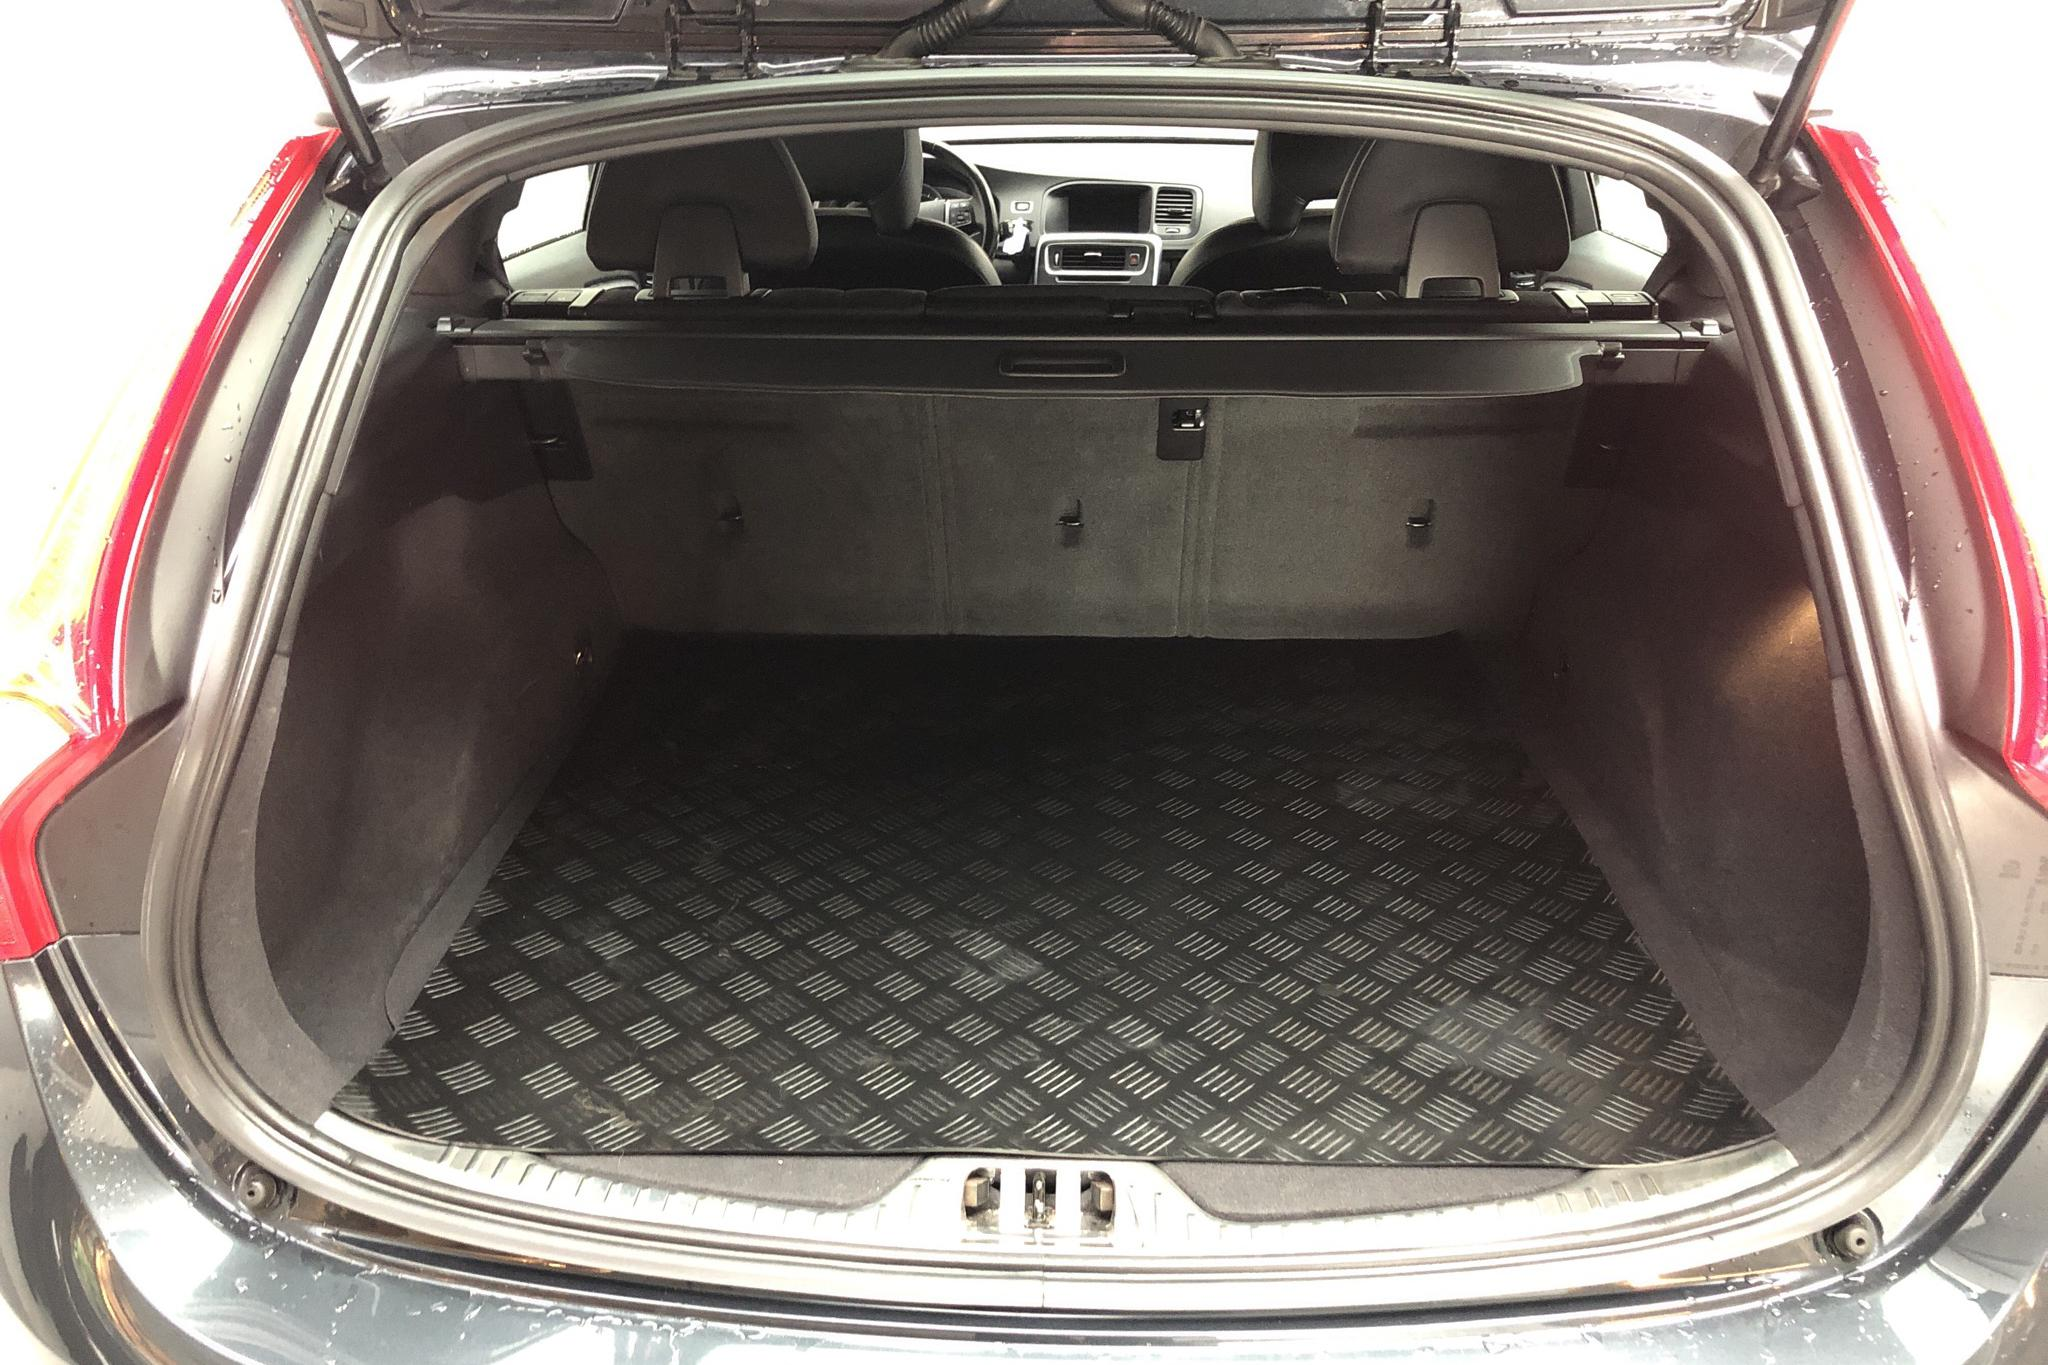 Volvo V60 D4 (190hk) - 69 020 km - Automatic - gray - 2018